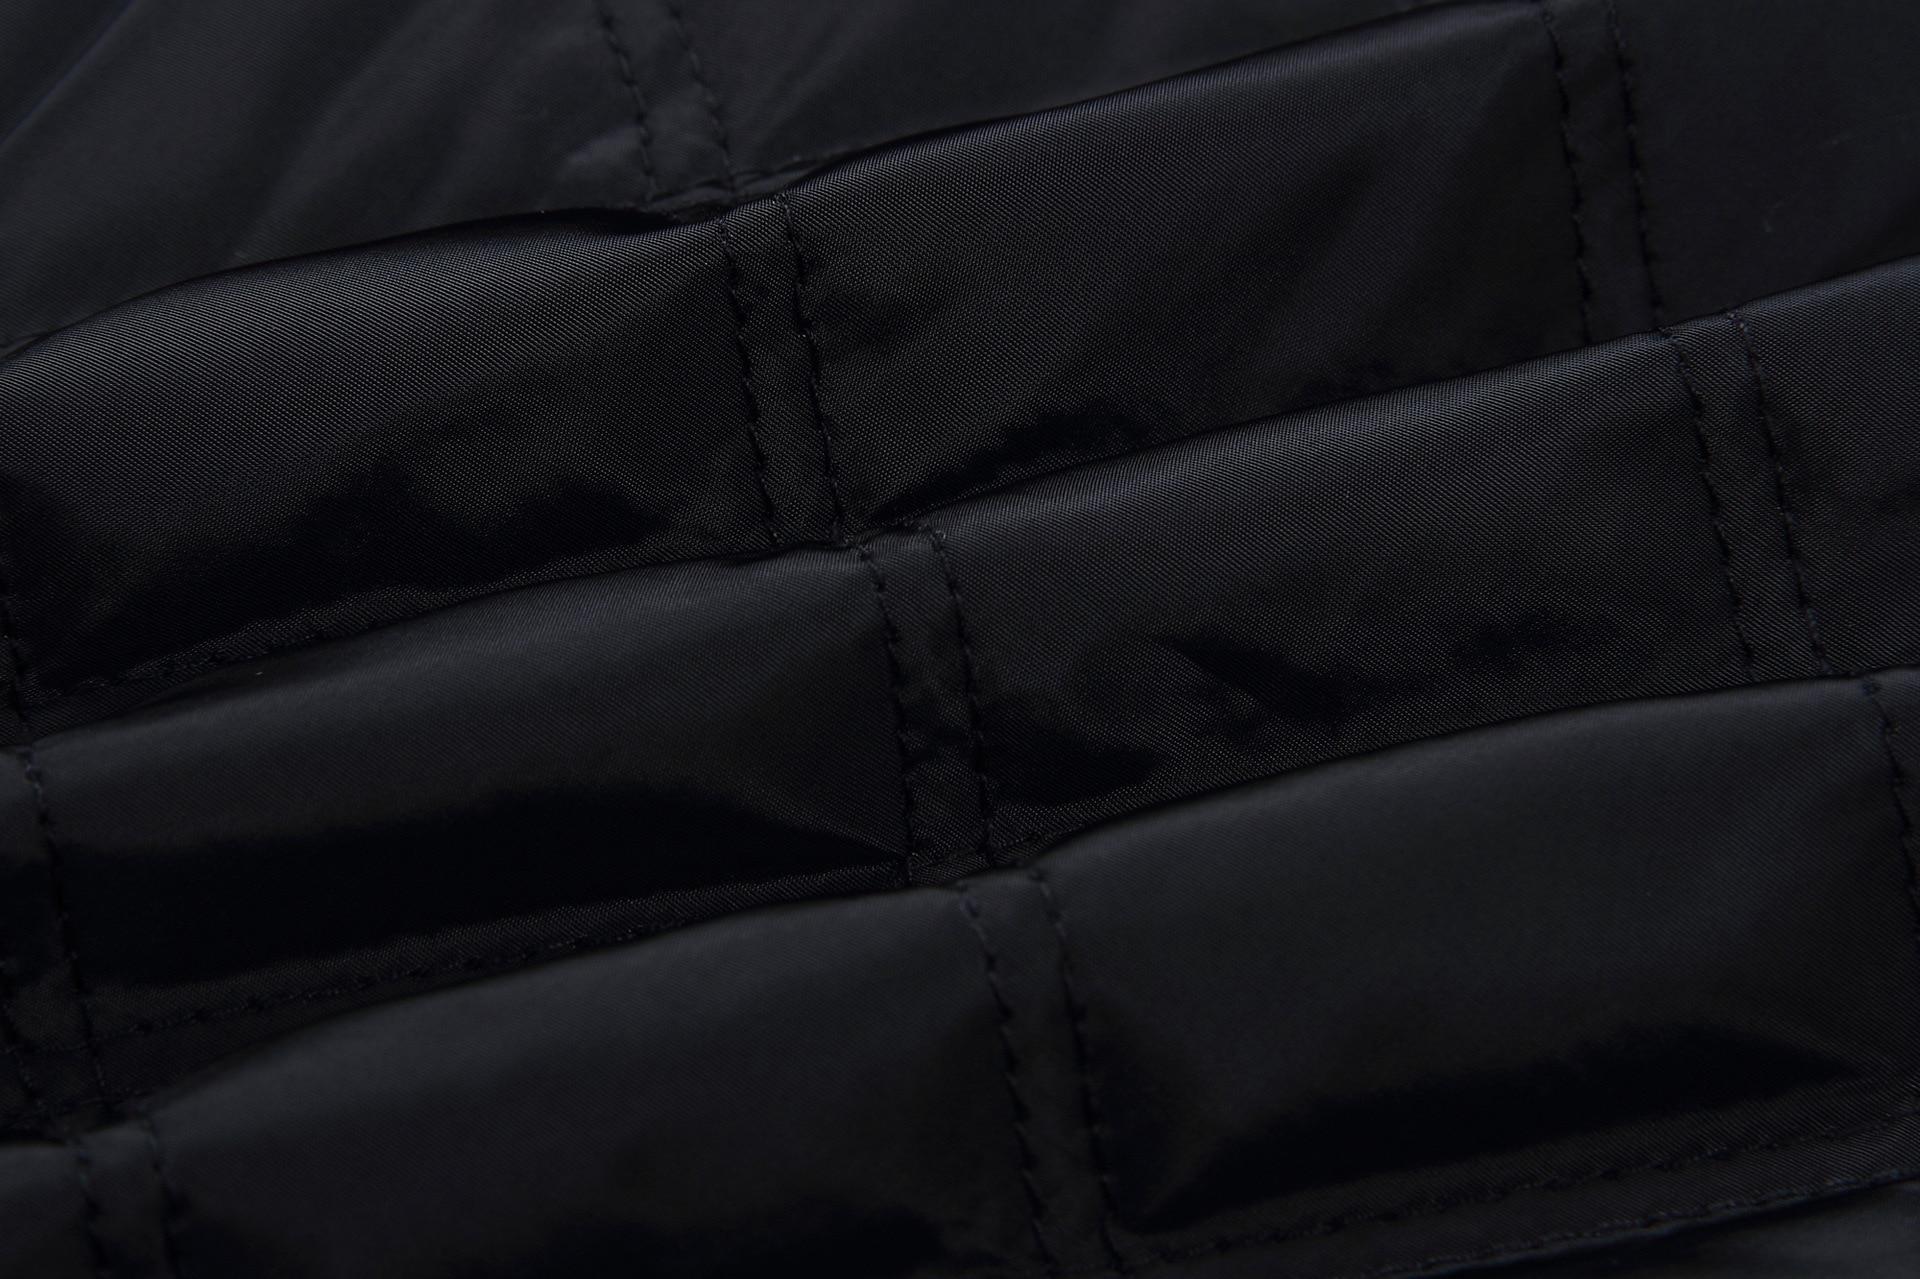 HTB1BWi6FhSYBuNjSsphq6zGvVXaX Plus Size Autumn Winter Fashion Slim Women's Jacket Zipper Cardigan Splice Bomber Jackets 2019 Long Sleeve Bodycon Coats Female